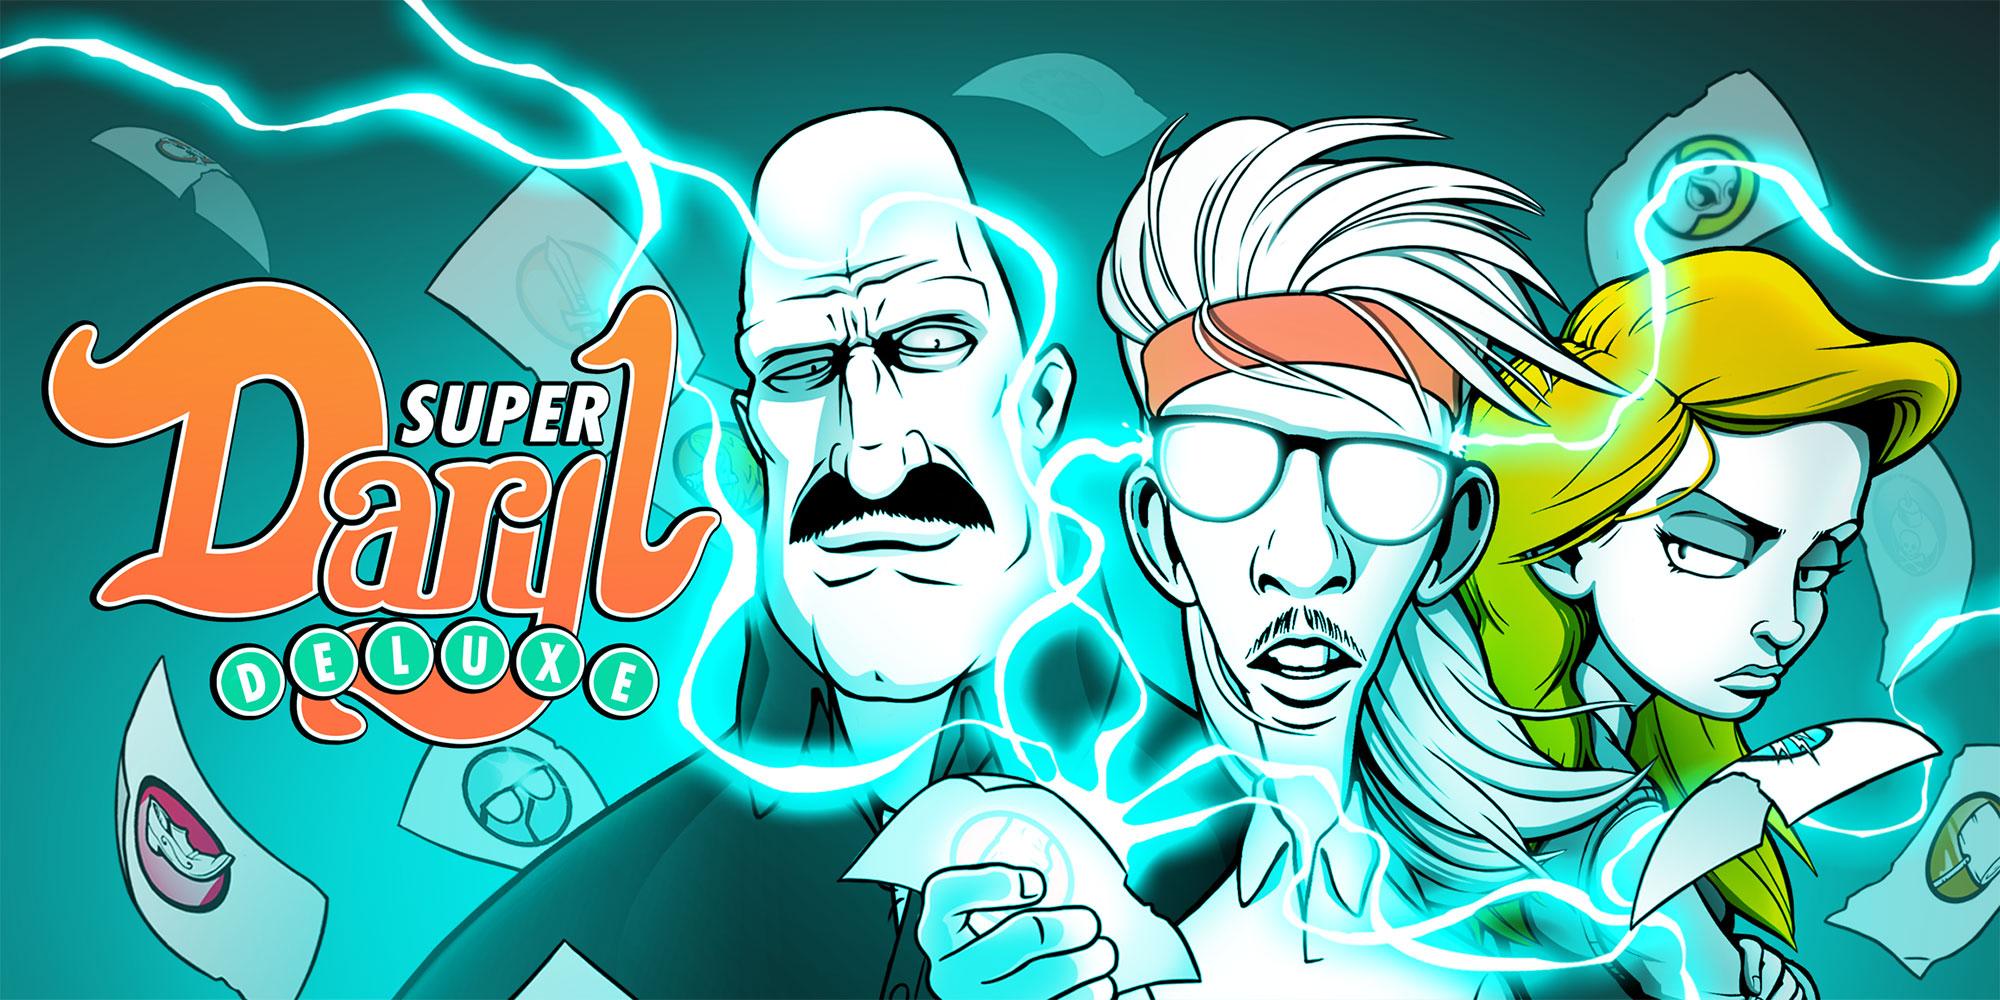 Super Daryl Deluxe (Steam Key/Region Free) 2019